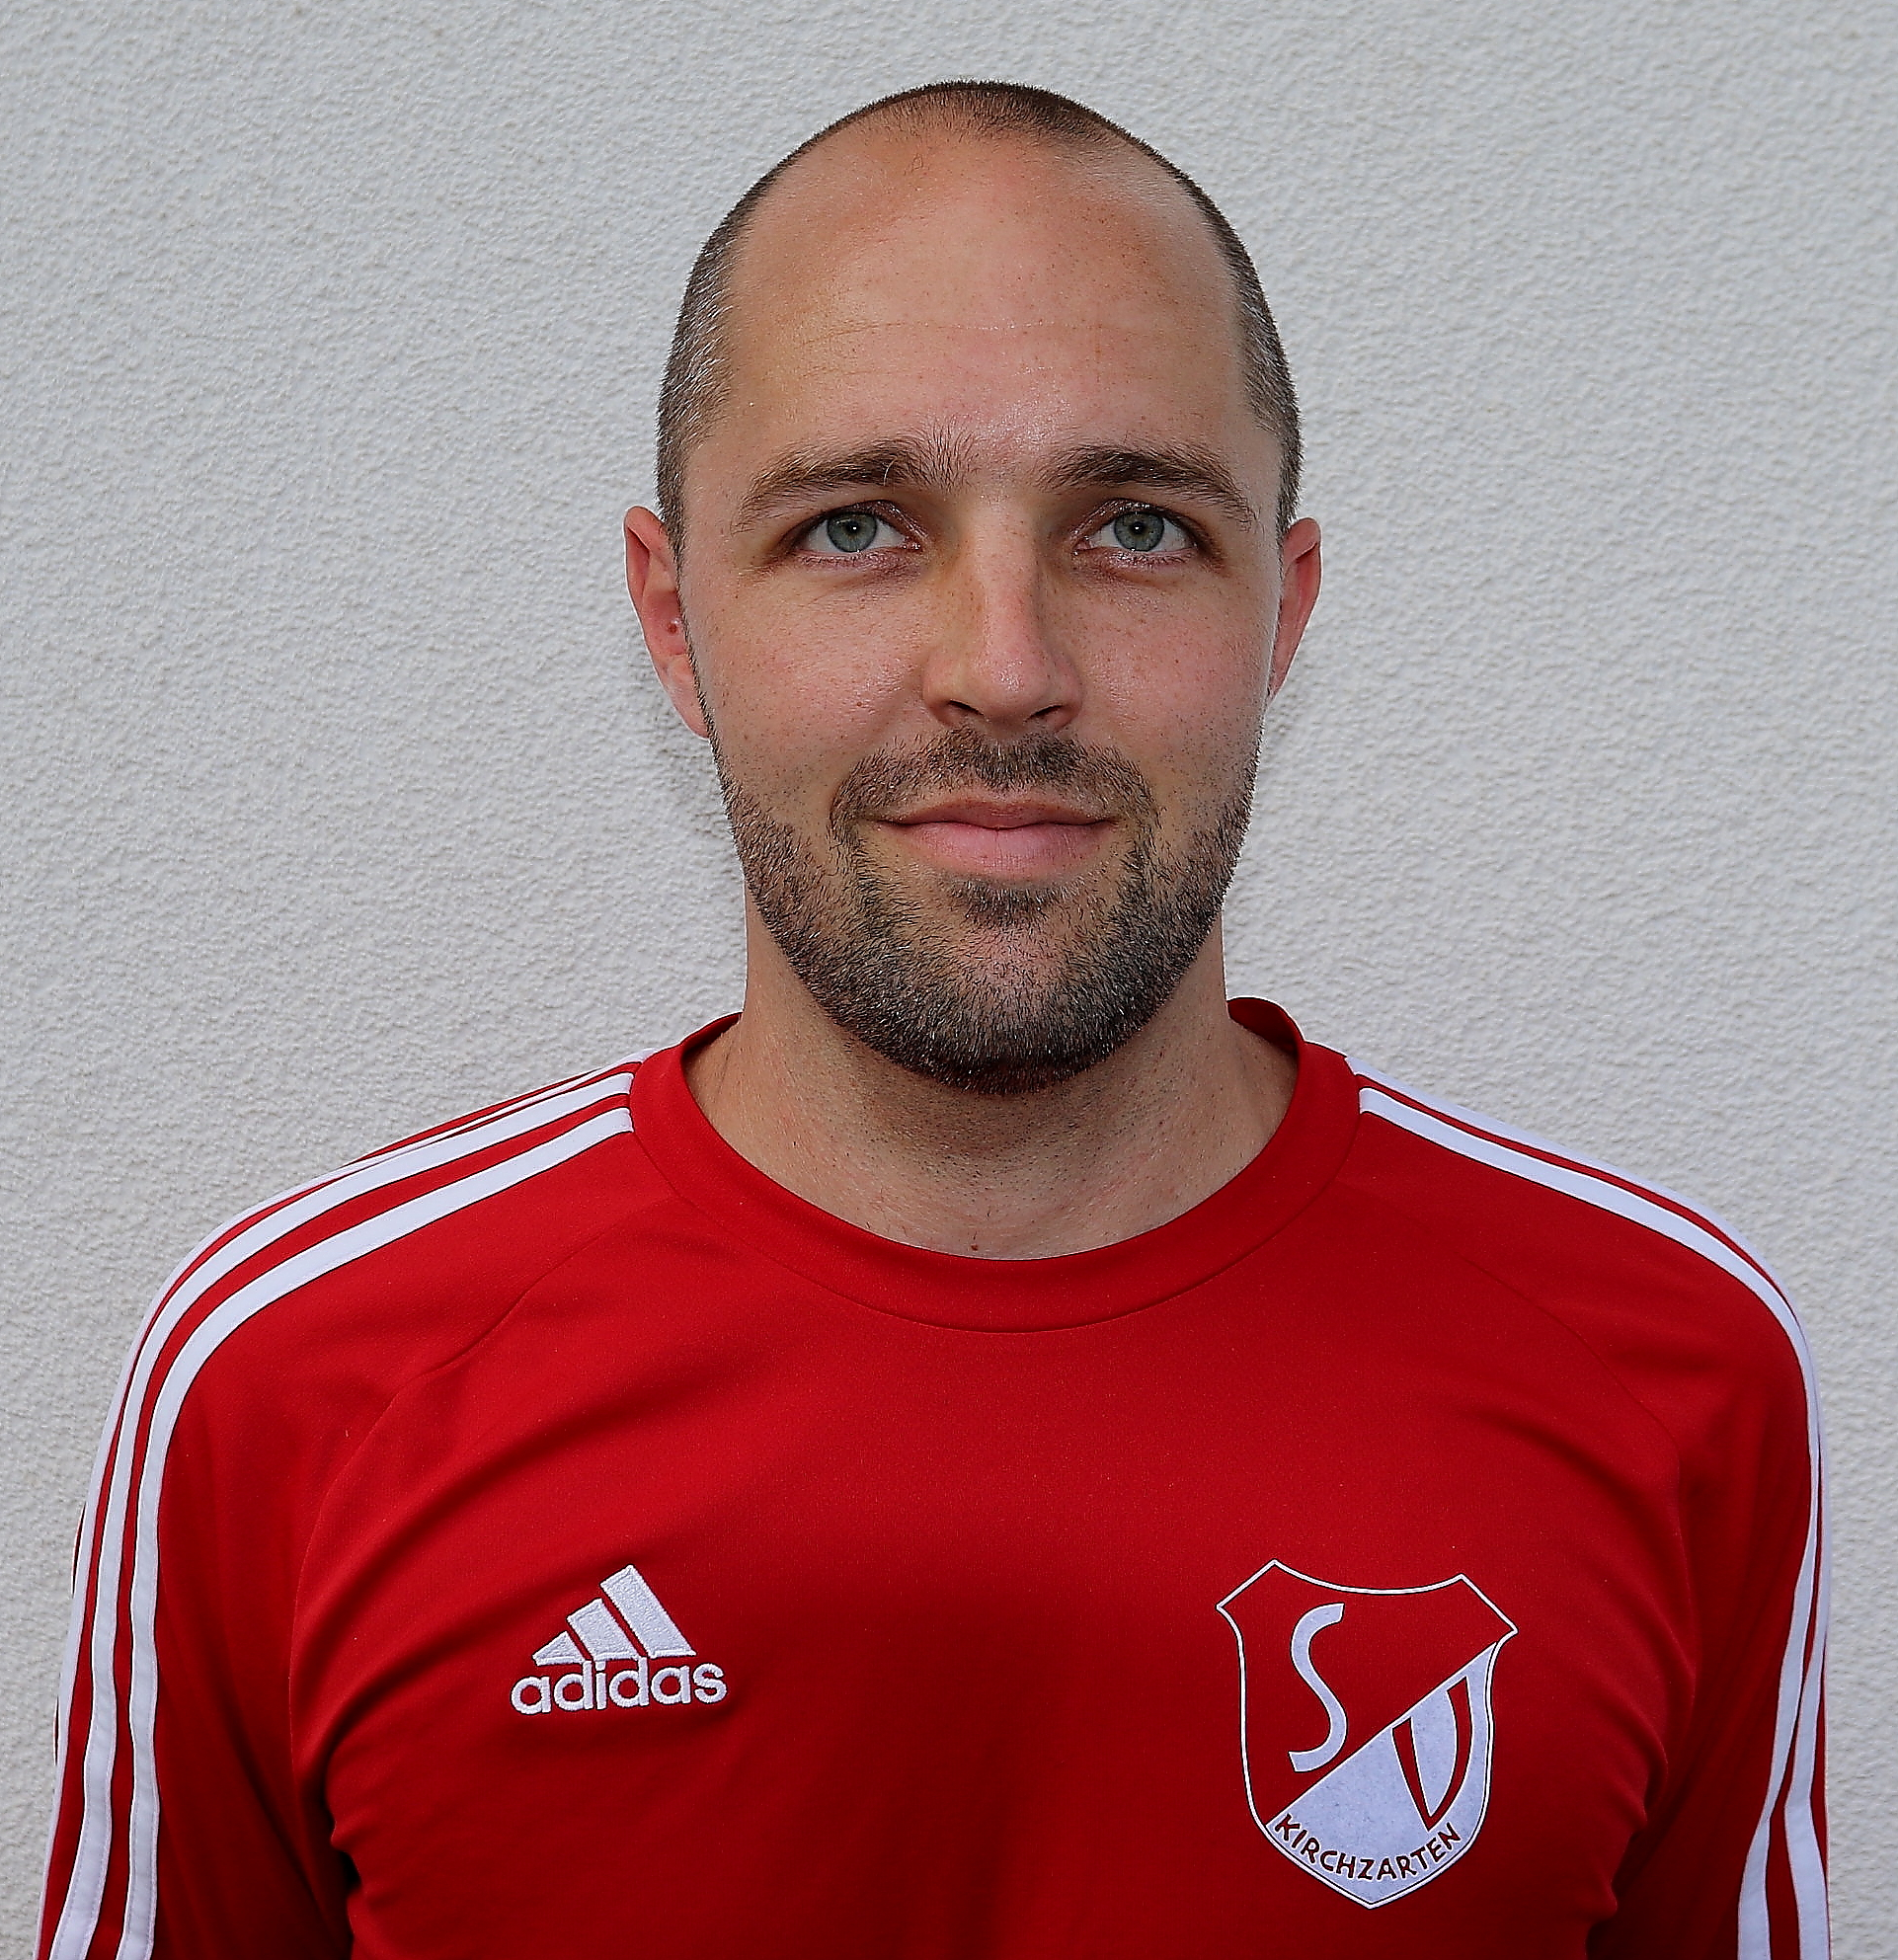 Tobias Göbel verlässt den SV Kirchzarten